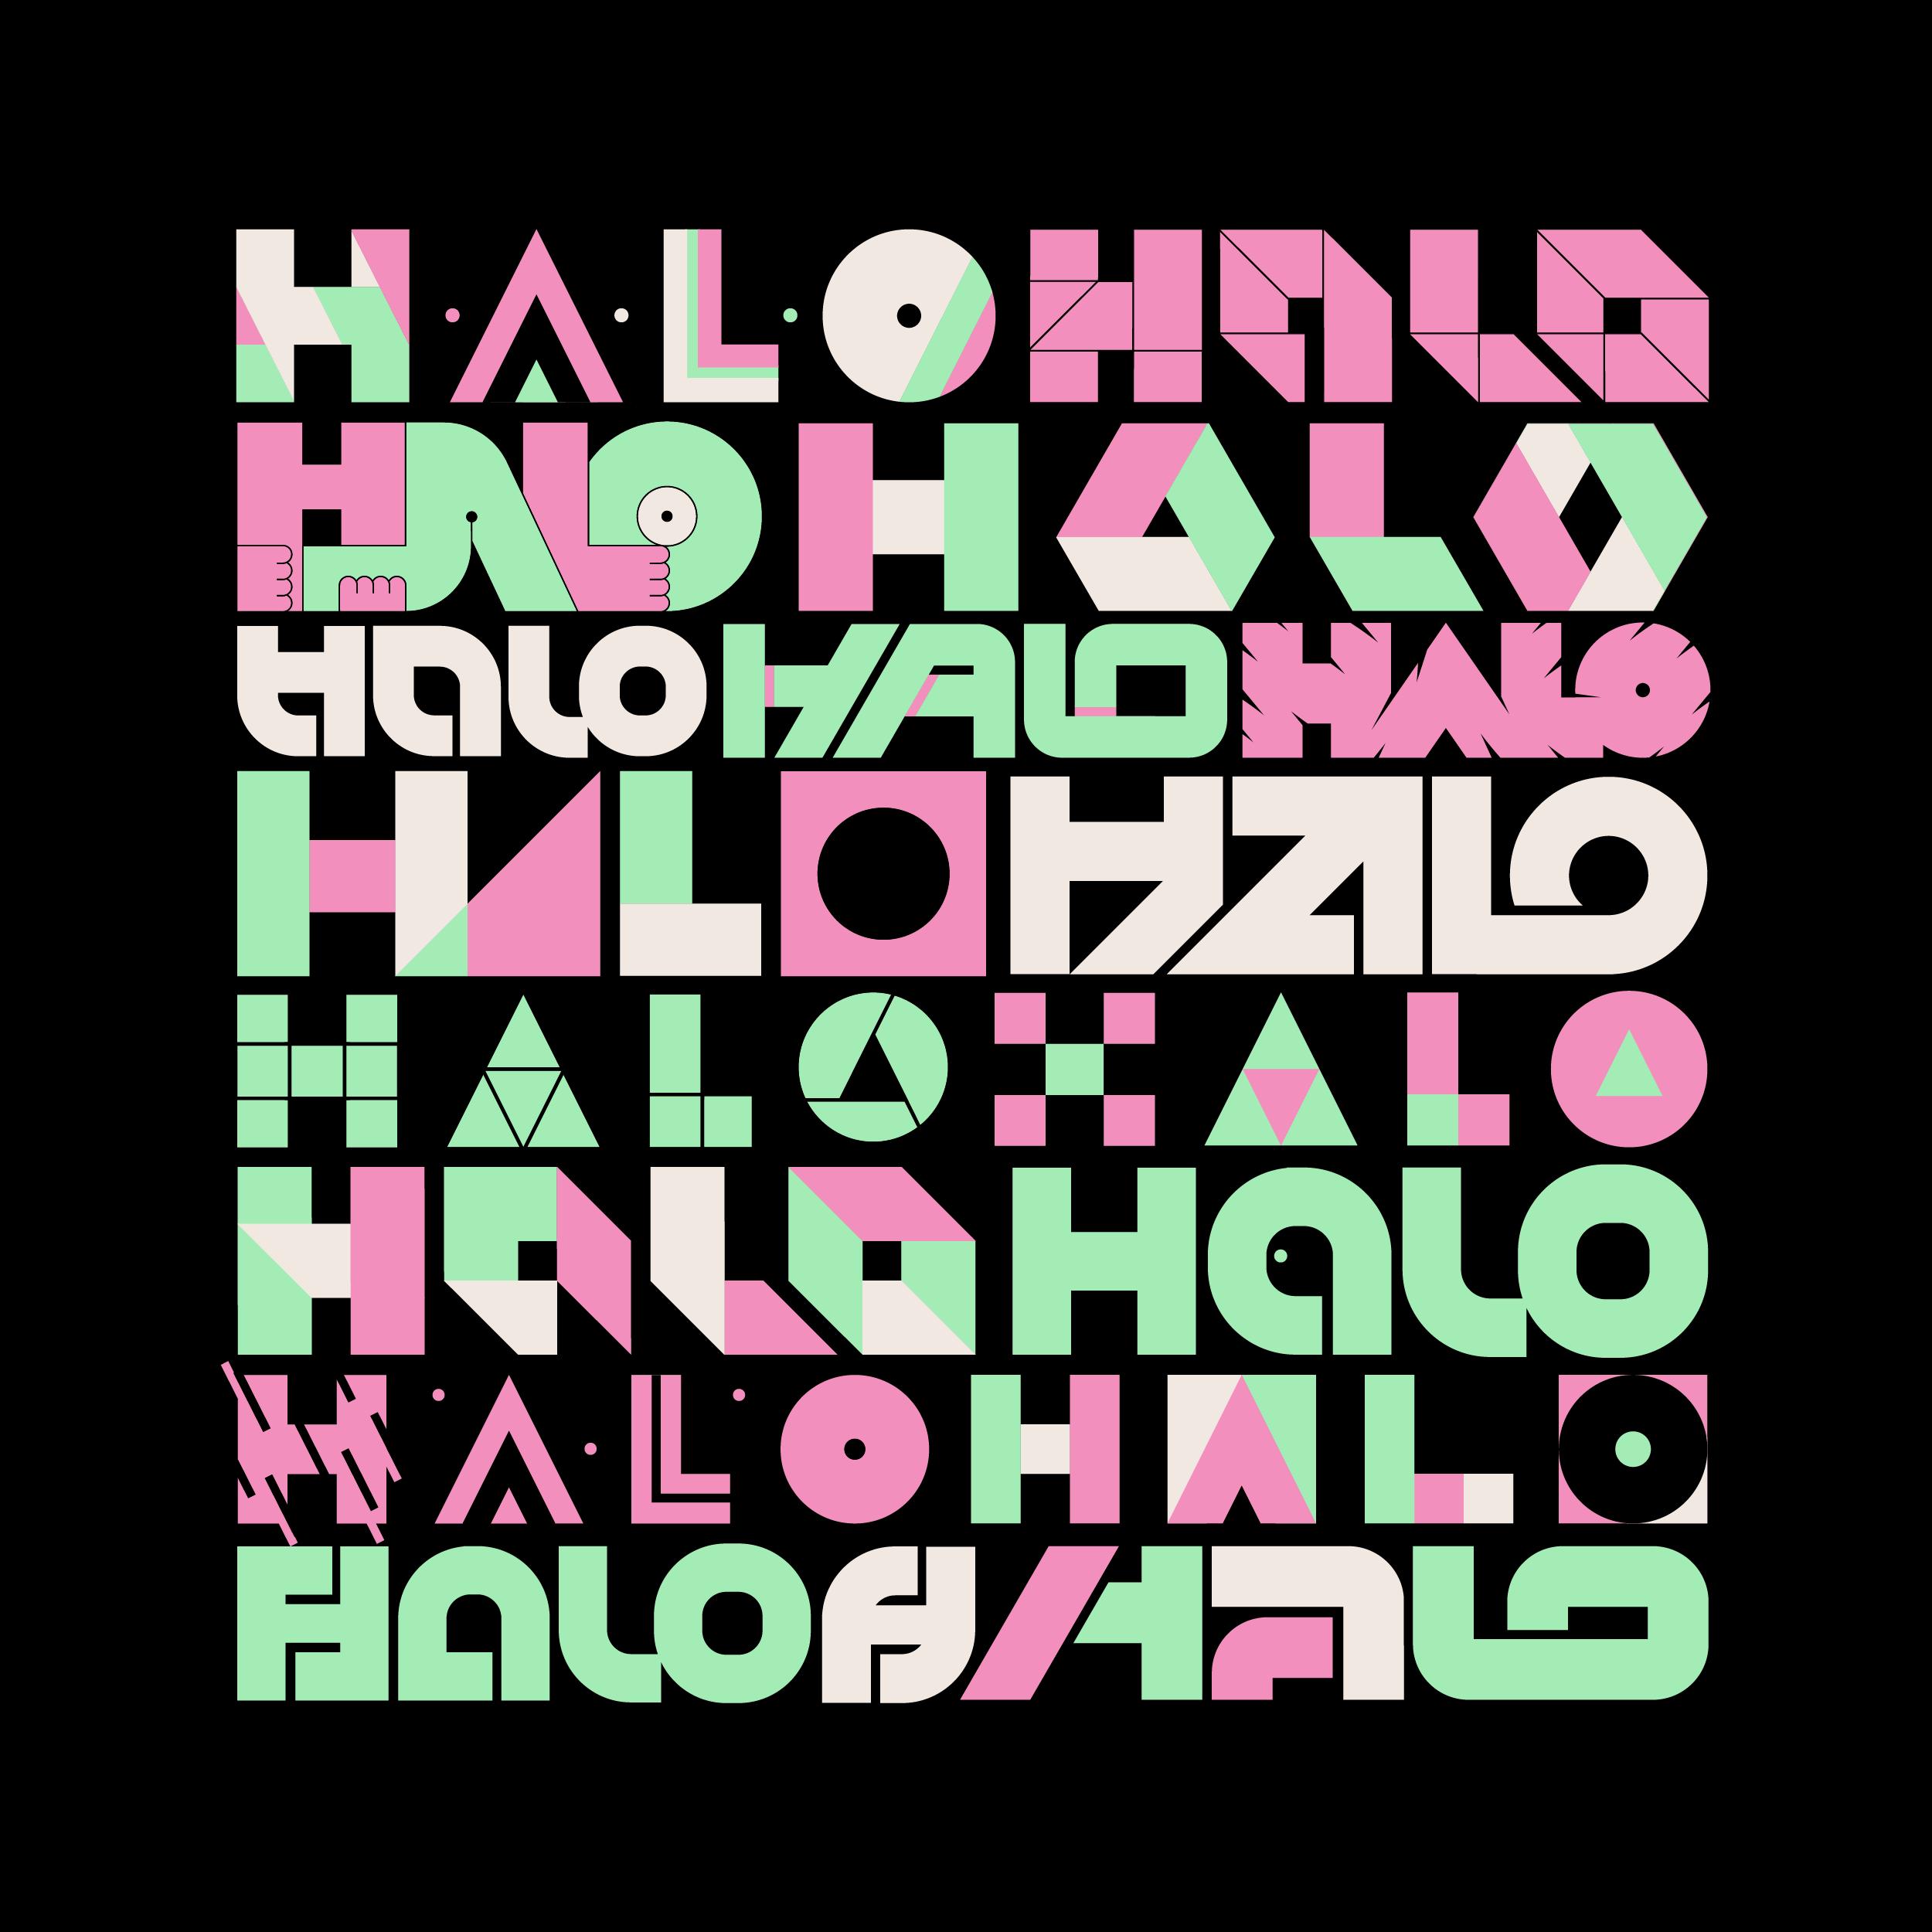 Nickelodeon / Halo